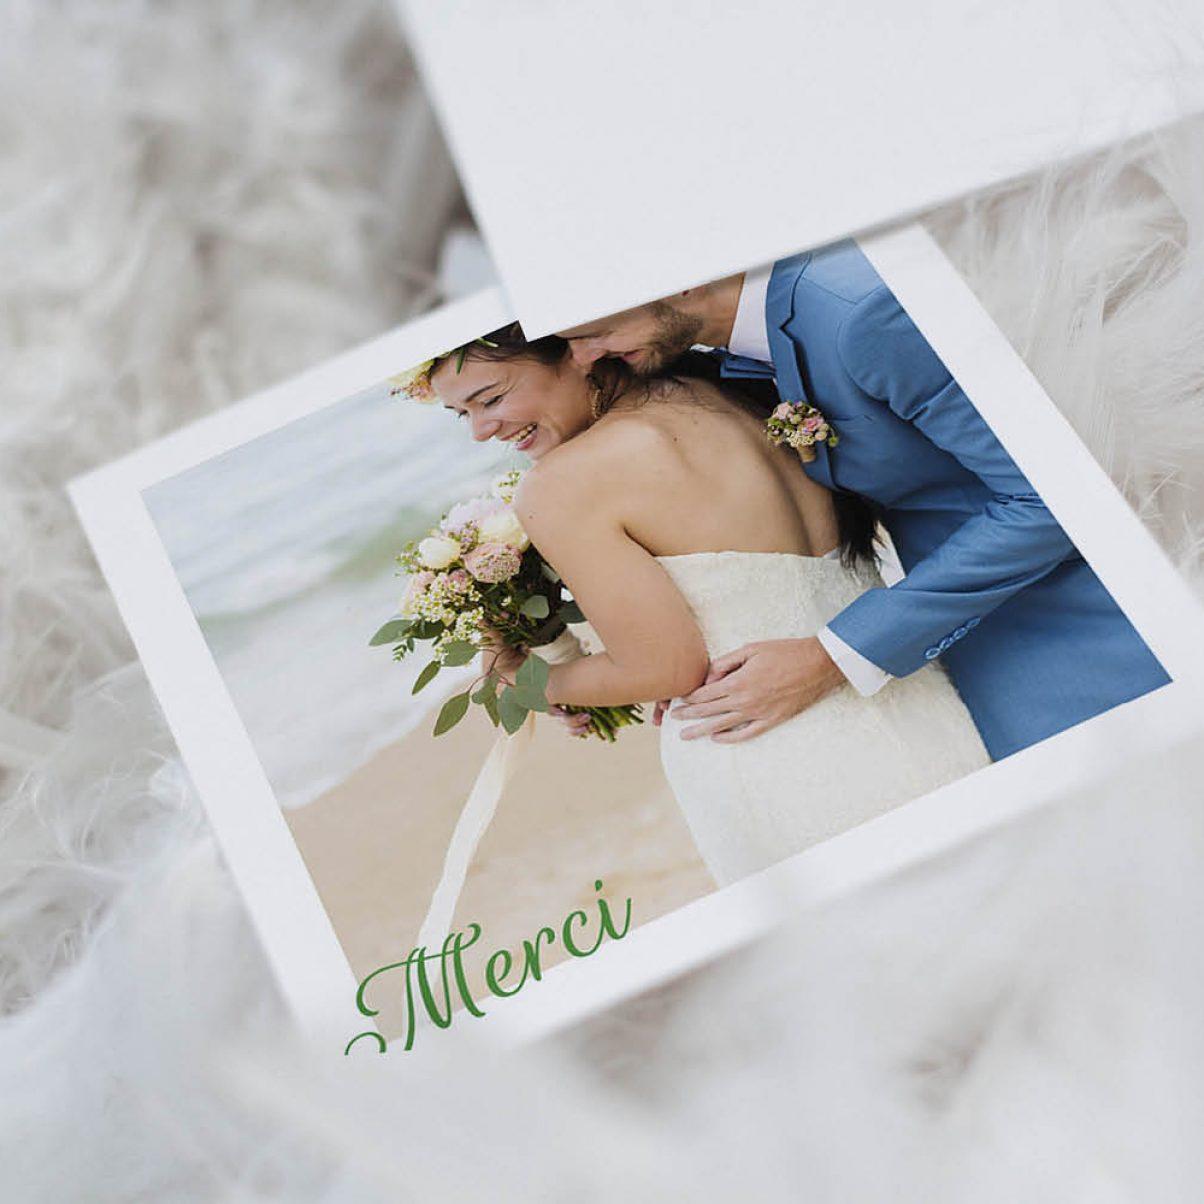 Le carton de remerciements du mariage de Julia & Thibaut - recto